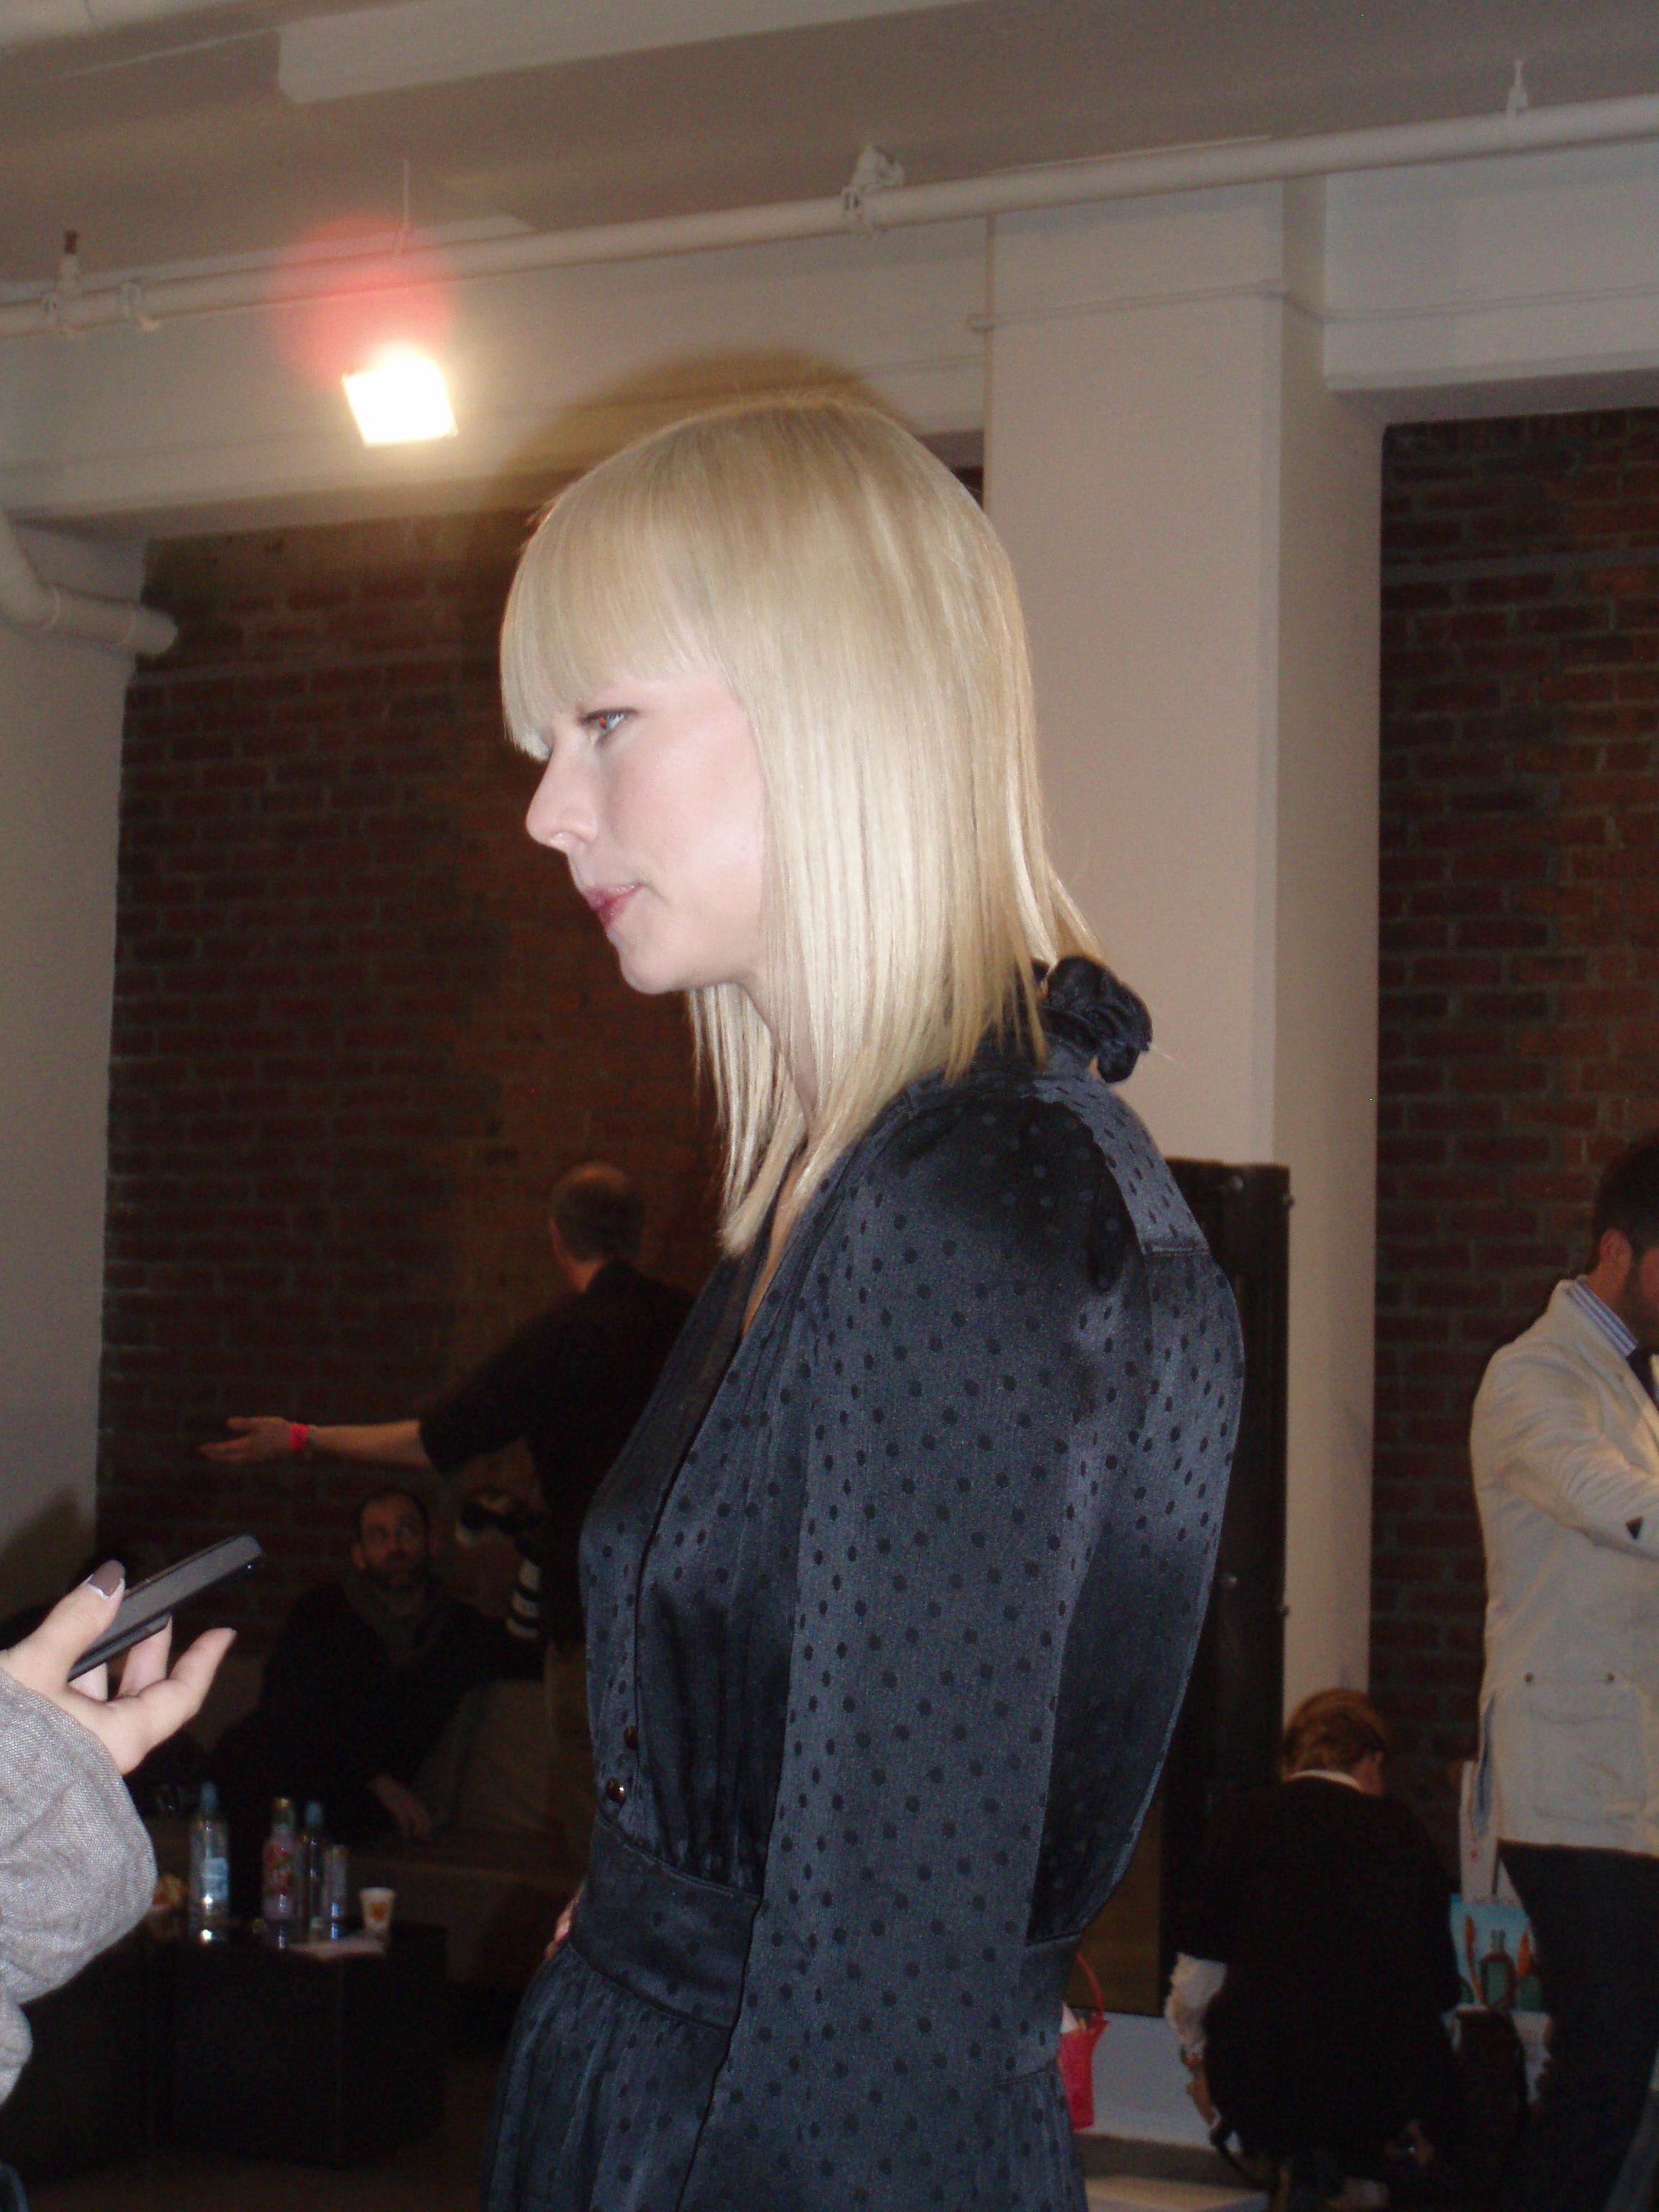 The designer, Erin Fetherston